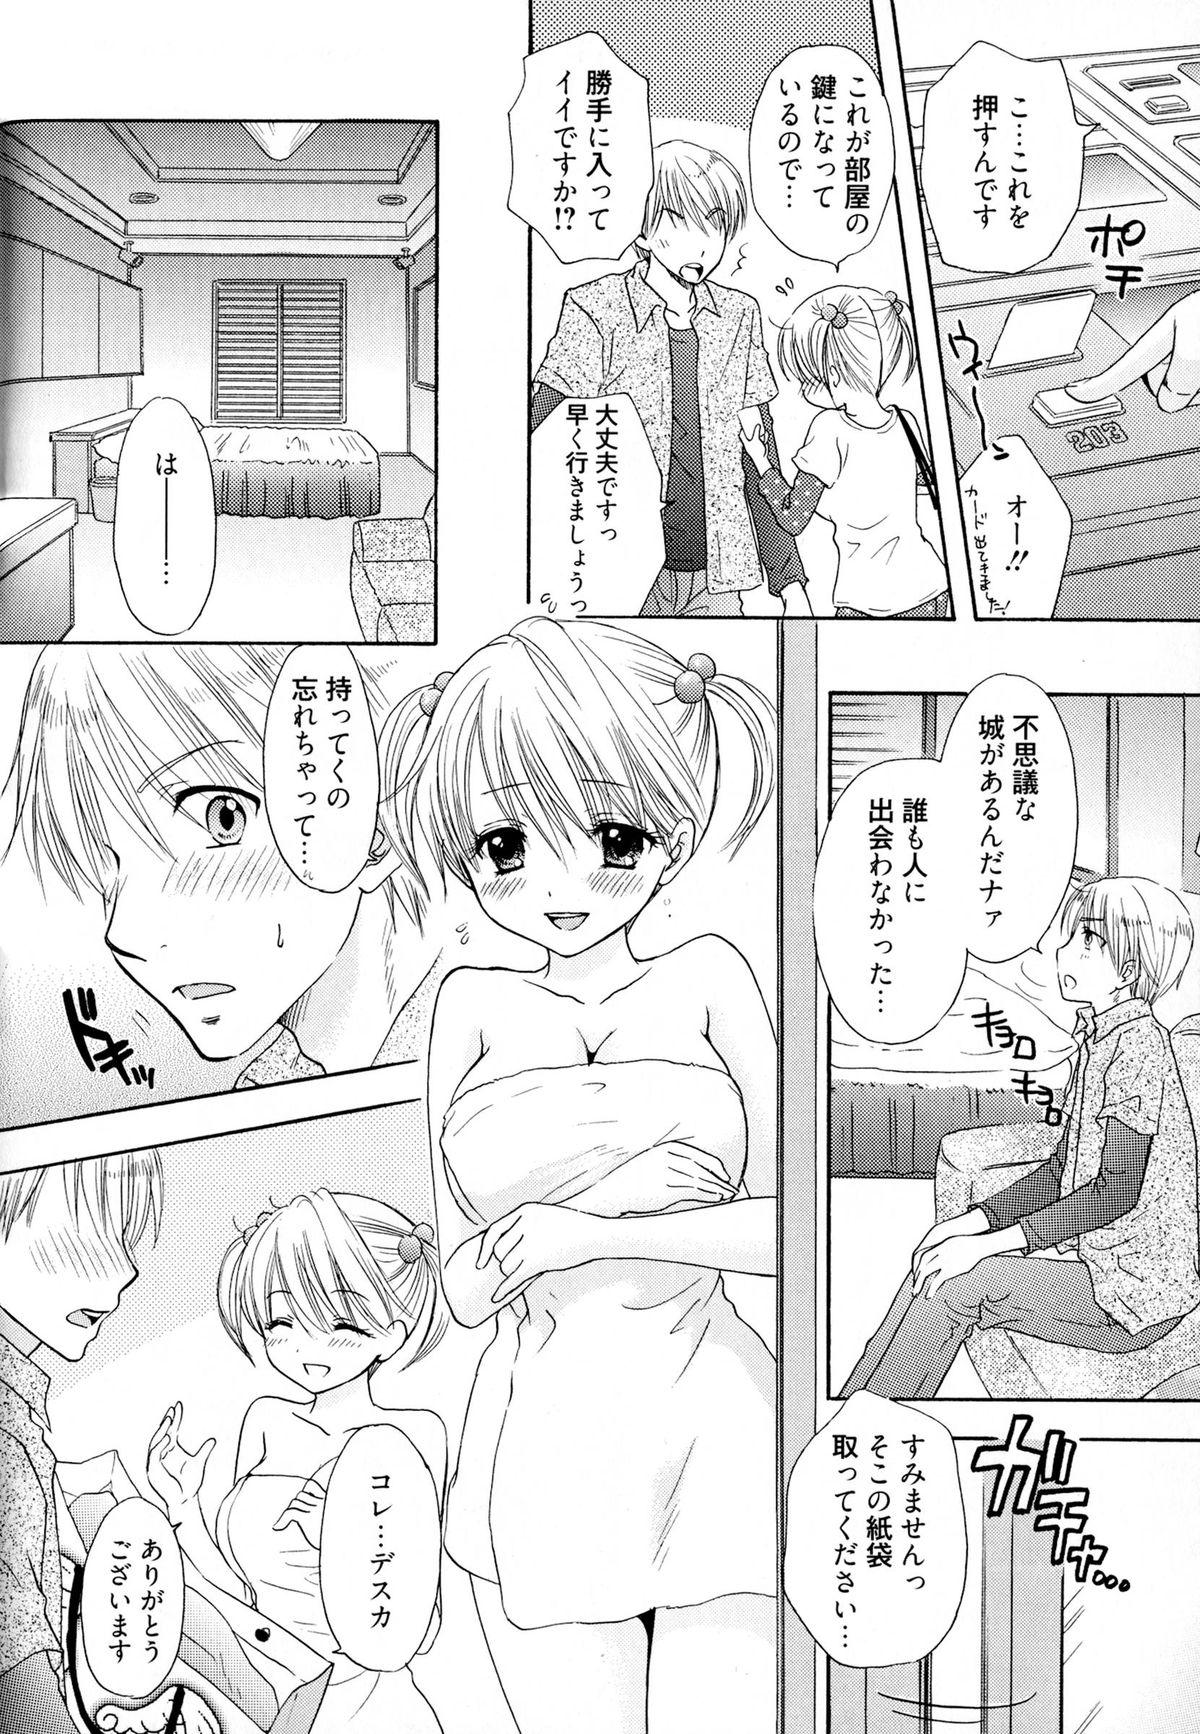 The Great Escape 4 Shokai Genteiban 155